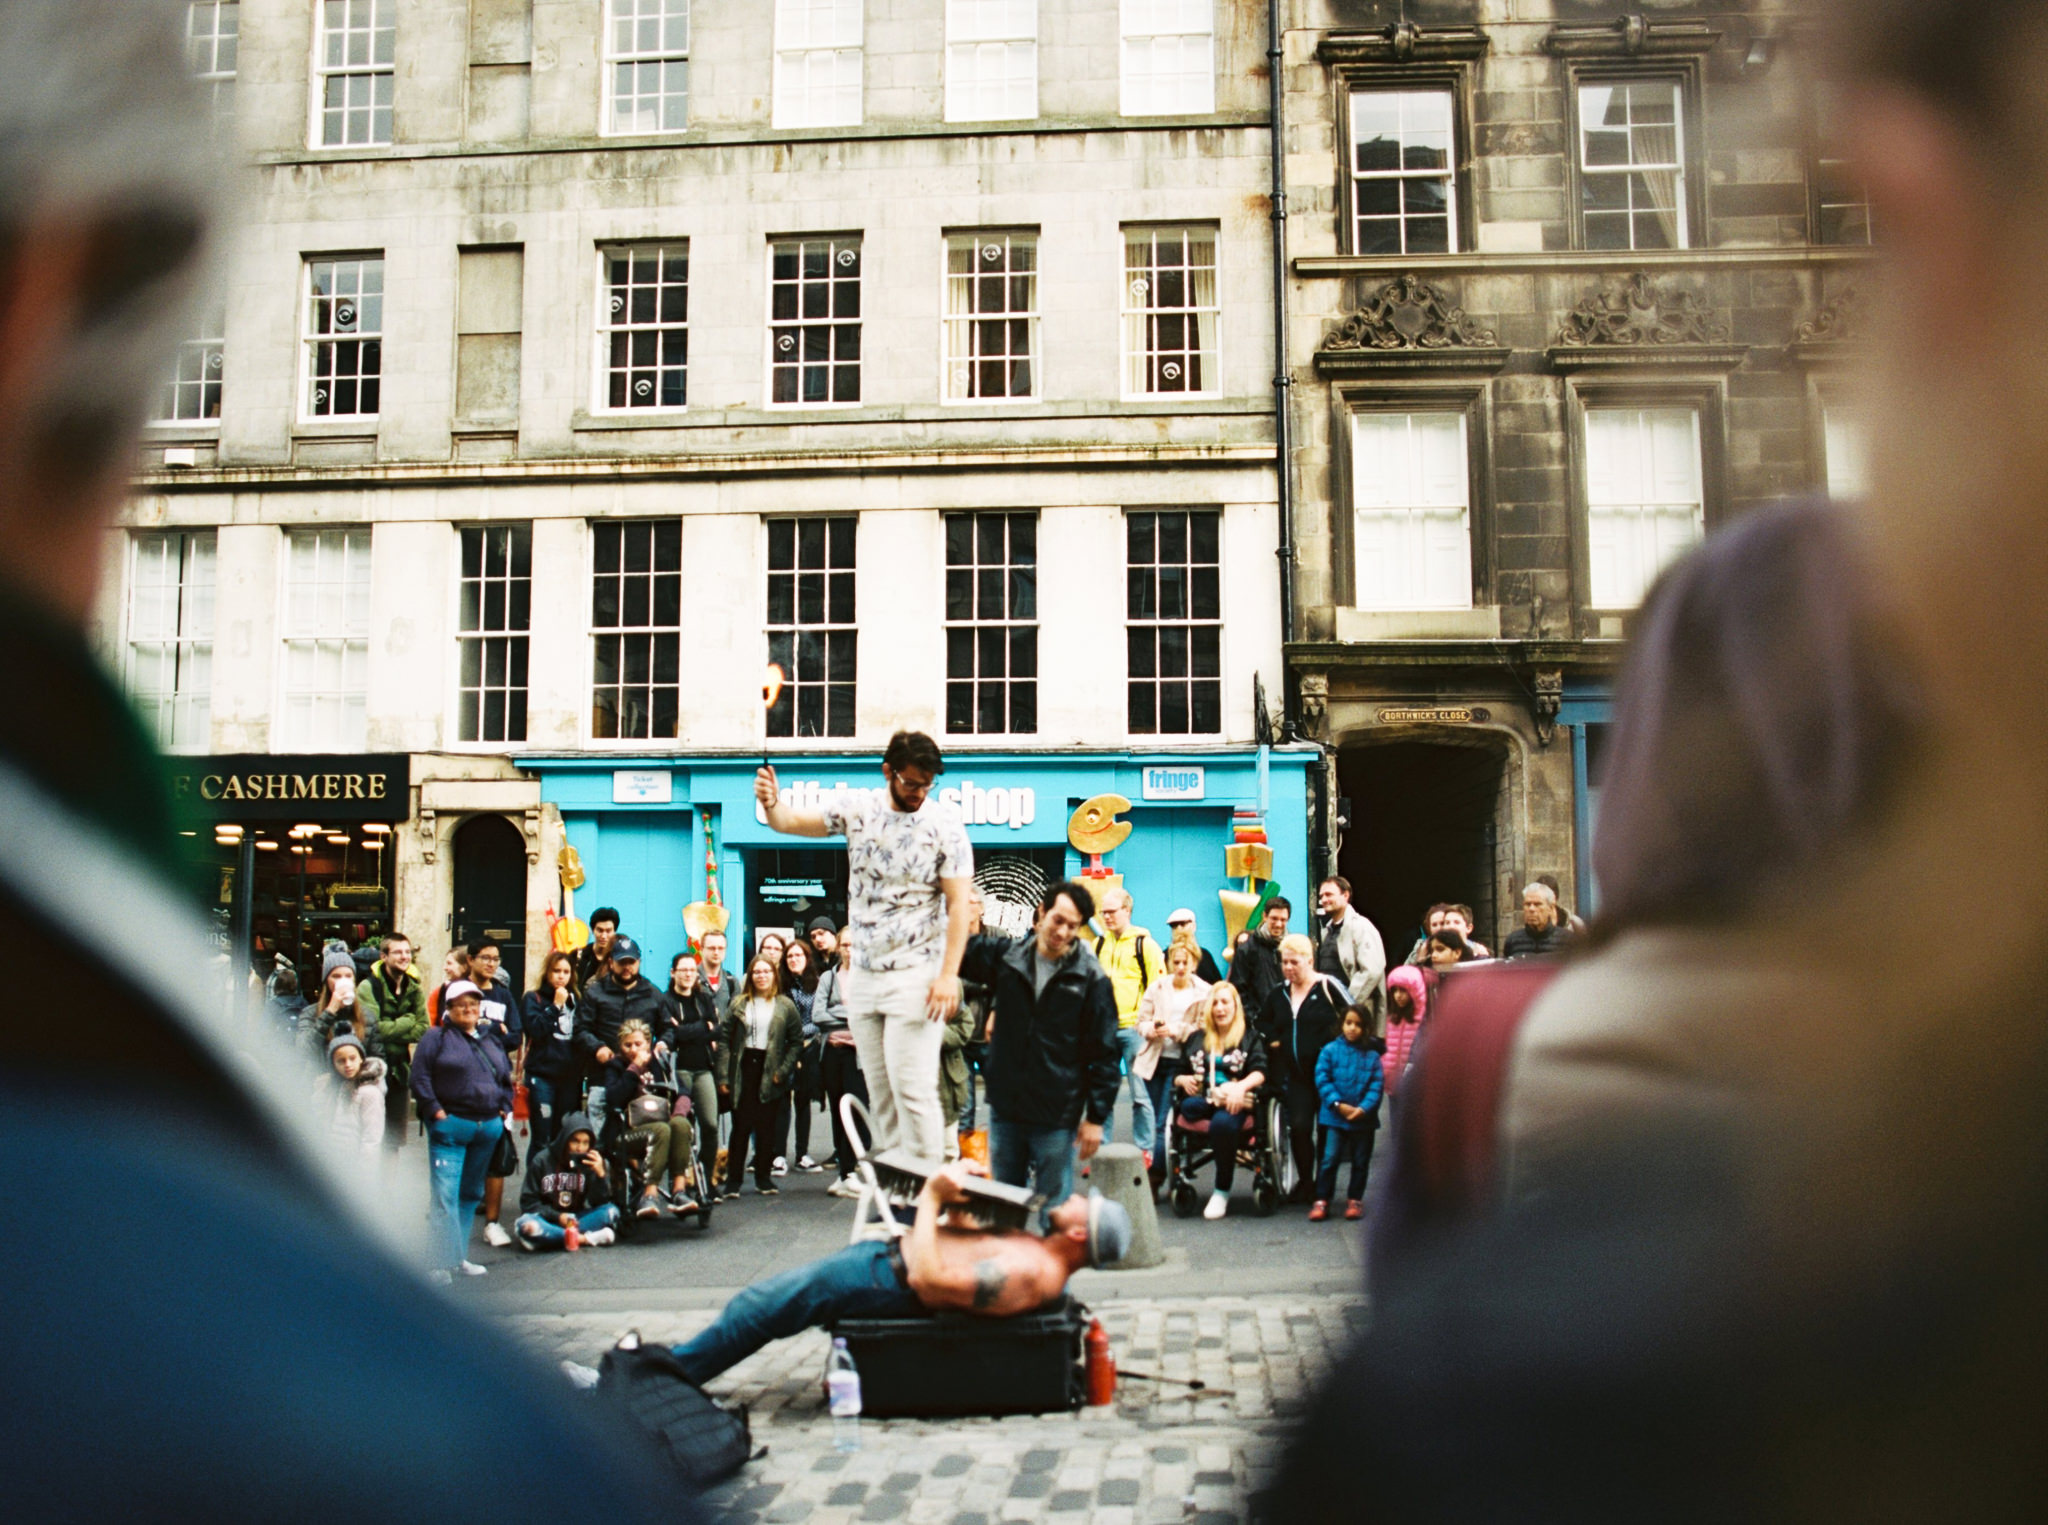 Scotland_Glasgow+Edinburgh_Day2-1.jpg